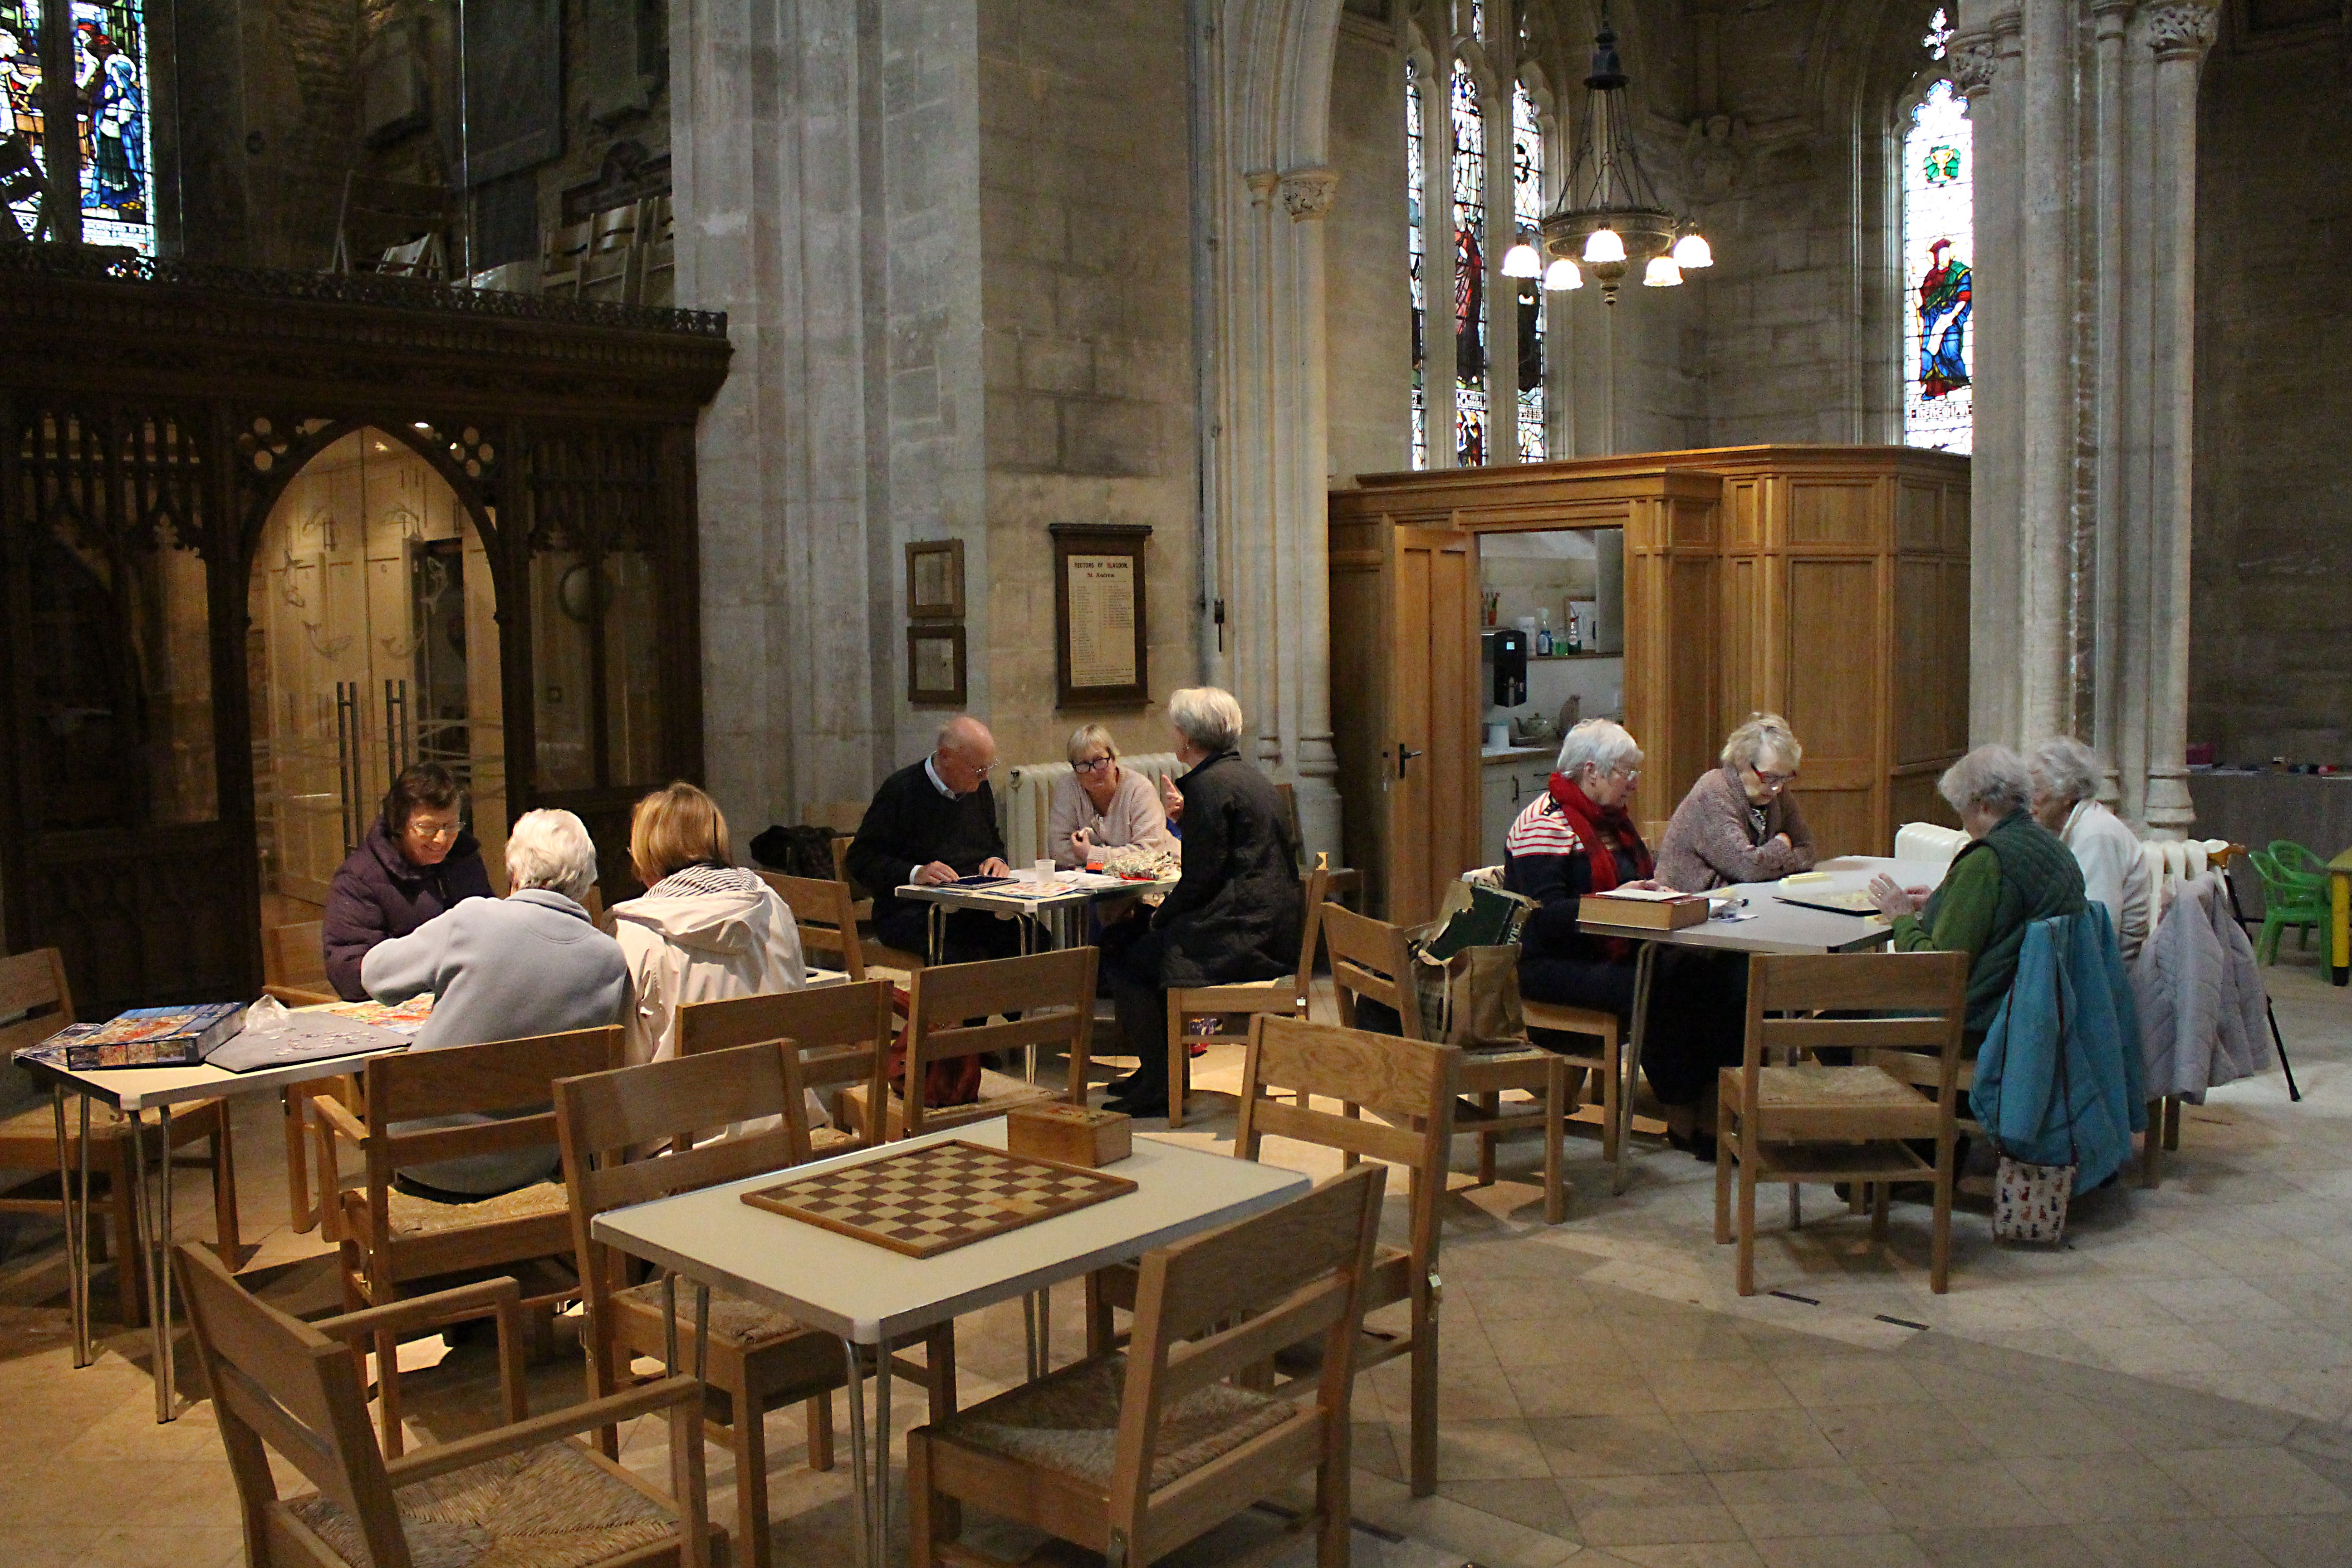 St Andrew's, Blagdon, Somerset